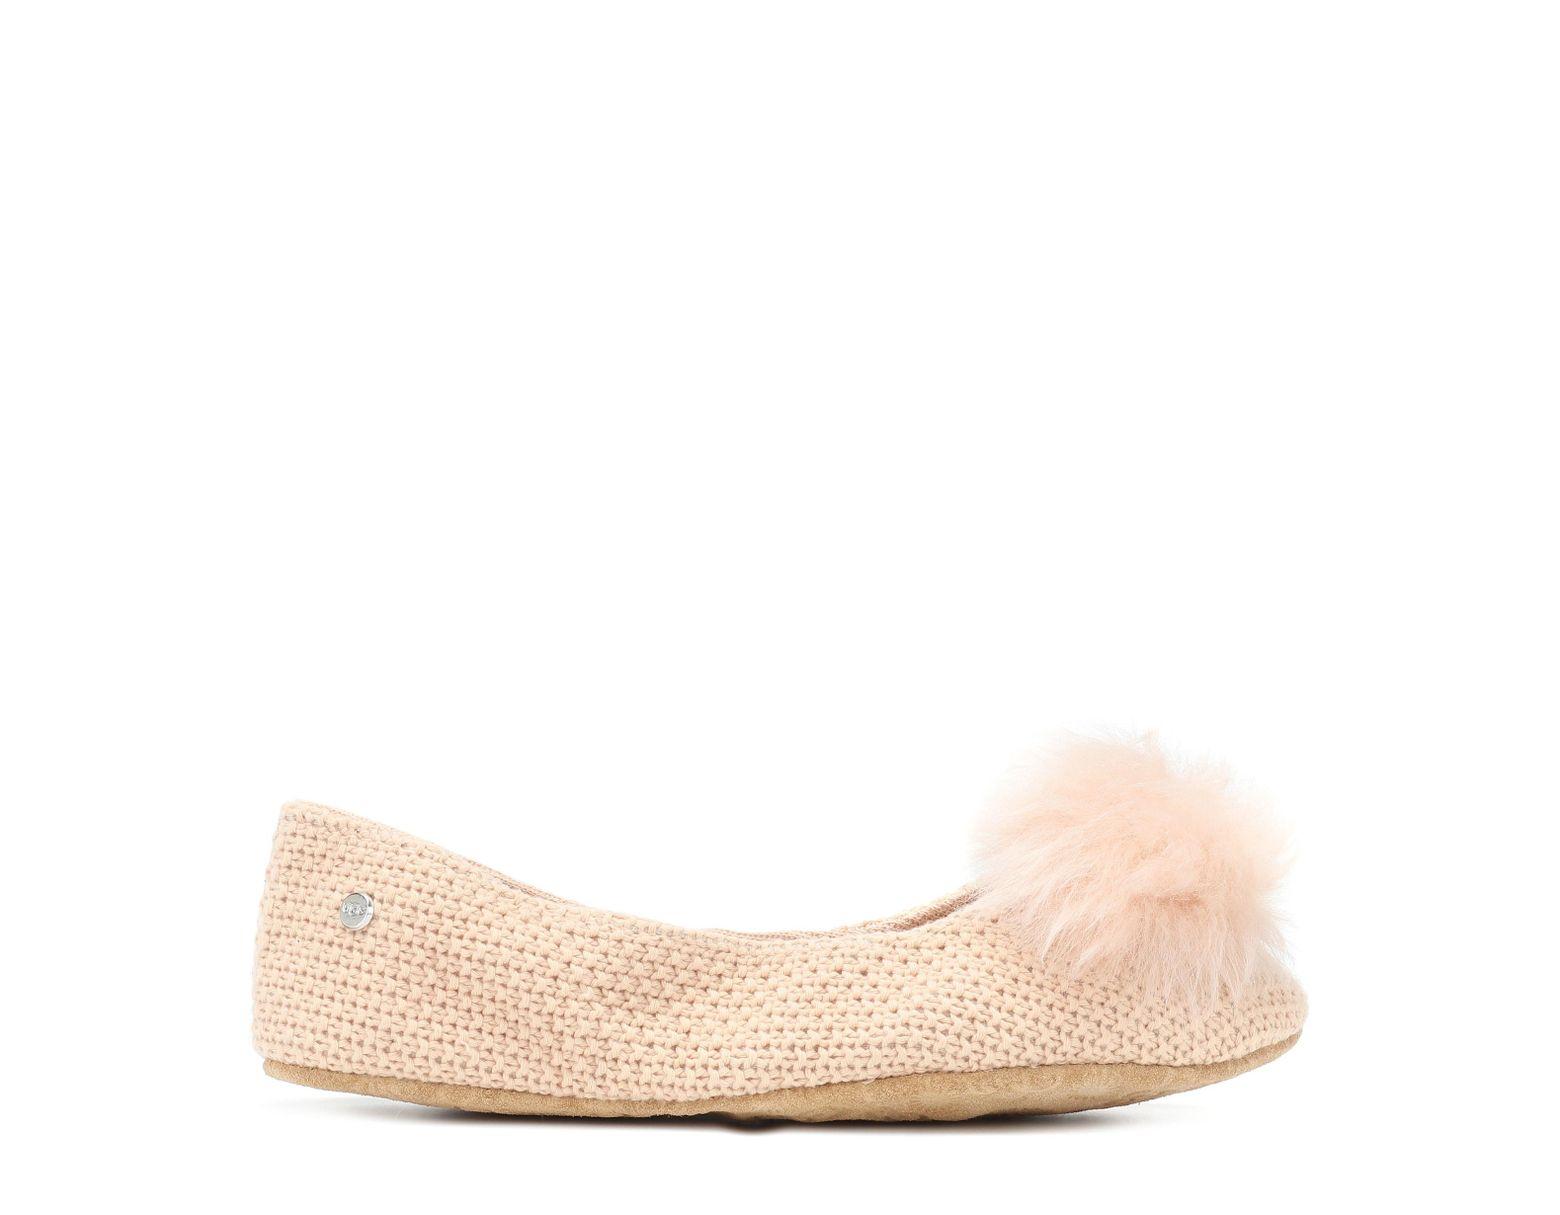 6e36785e9 UGG Andi Cotton Knit Slippers - Lyst